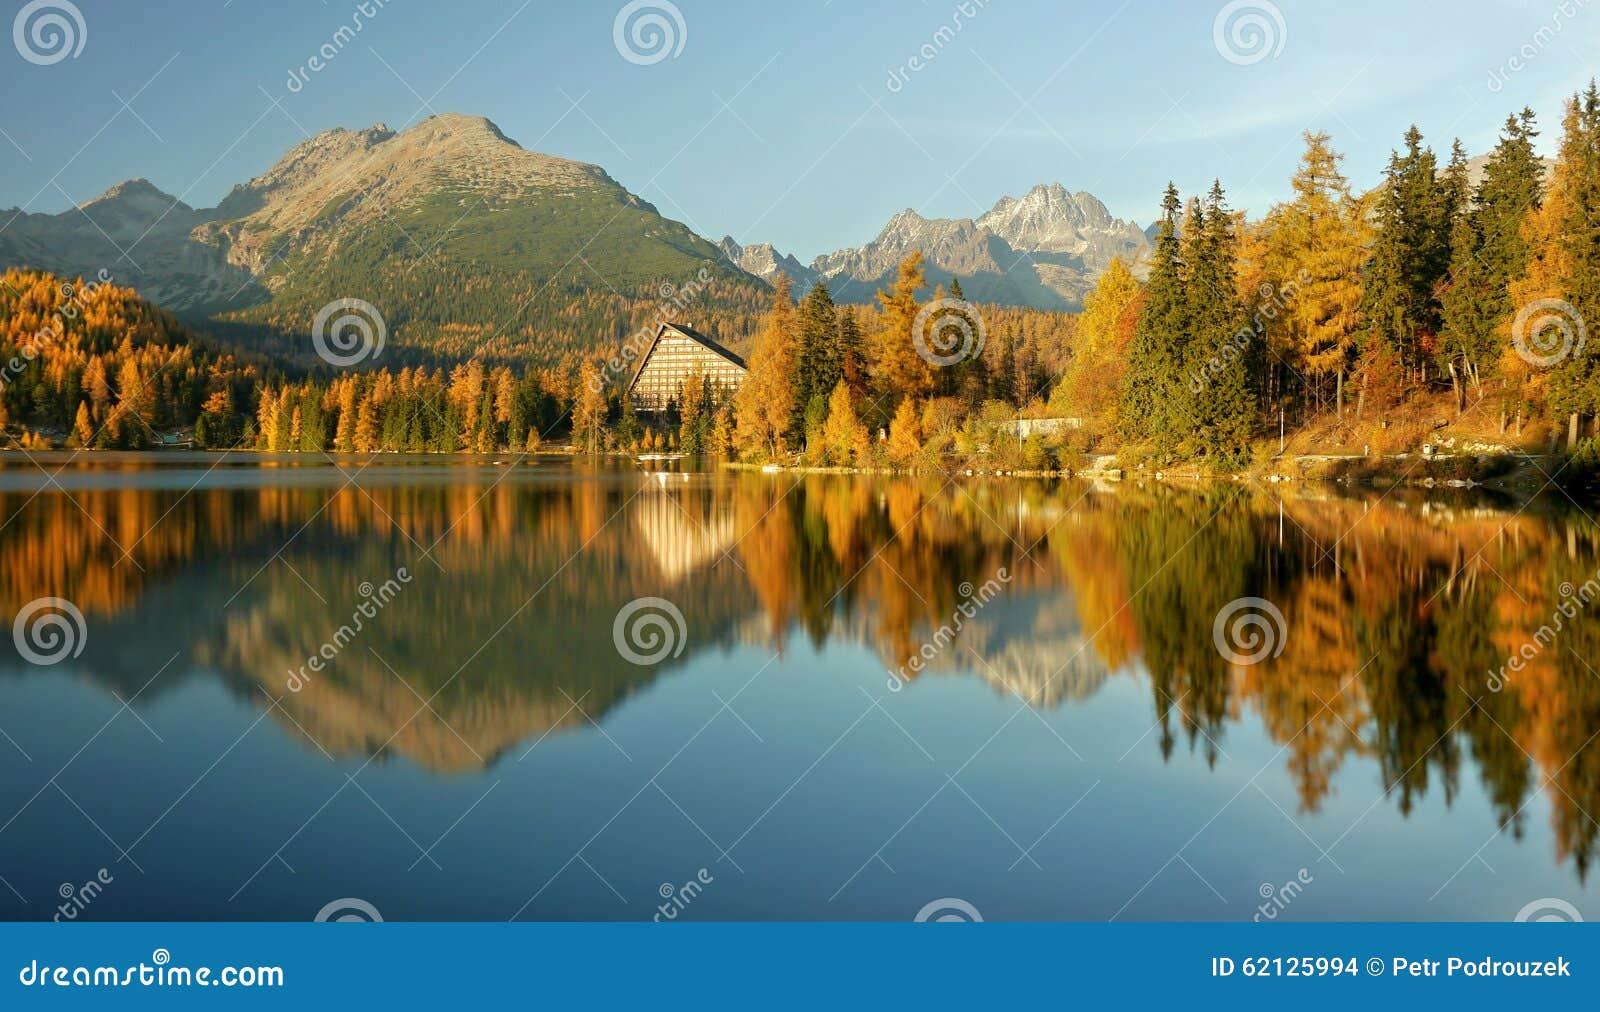 Autumn colored mountain lake - High Tatras